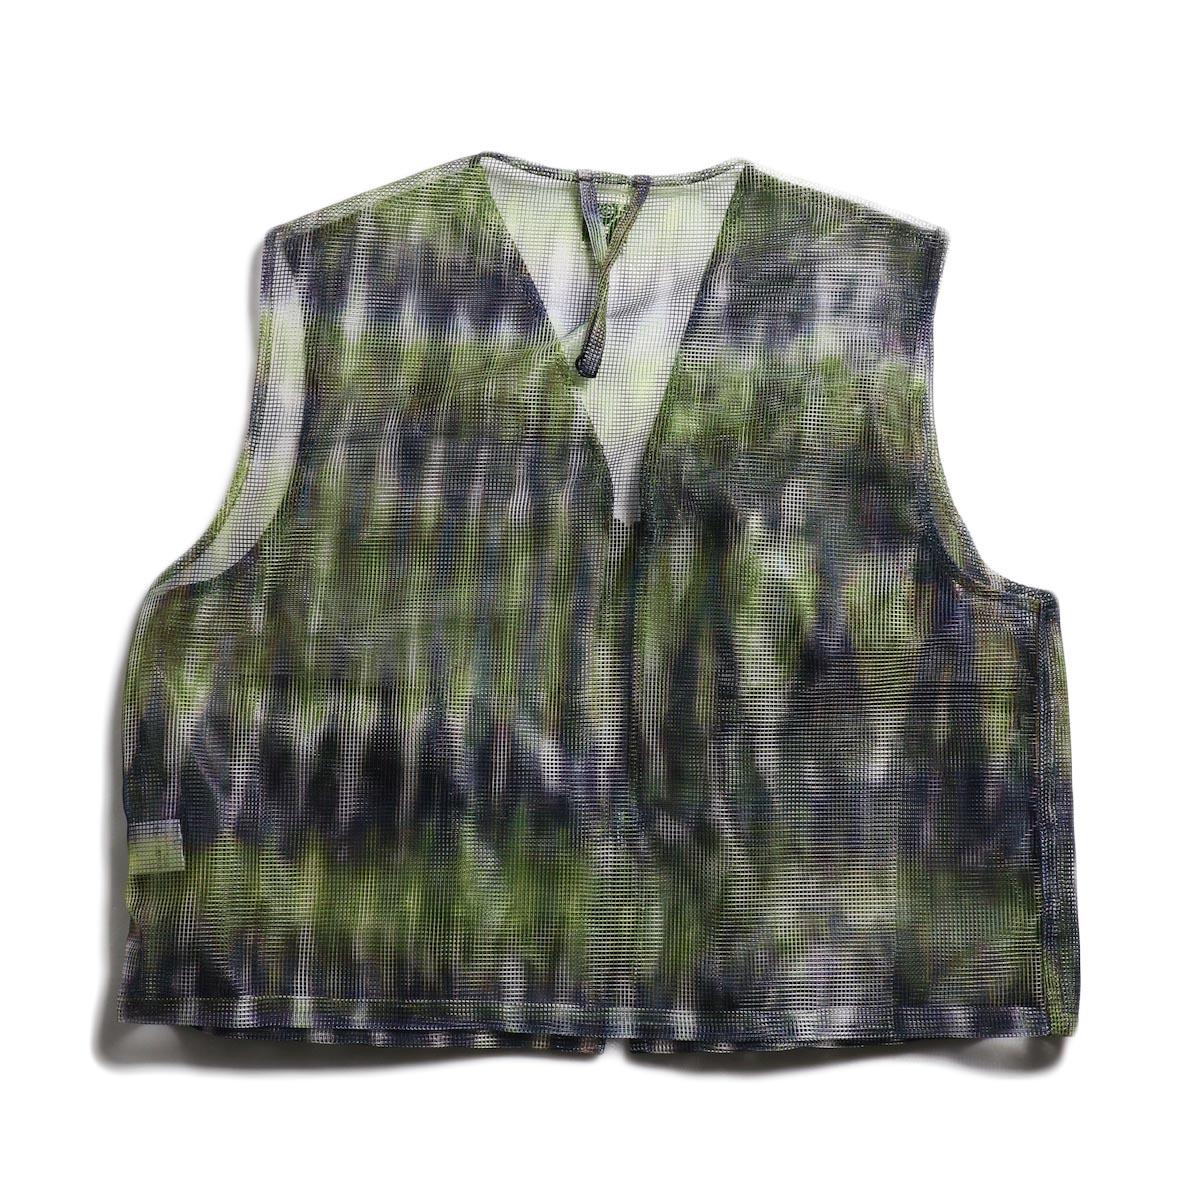 SOUTH2 WEST8 / Mesh Bush Vest -Poly Mesh (Tie Dye) 背面